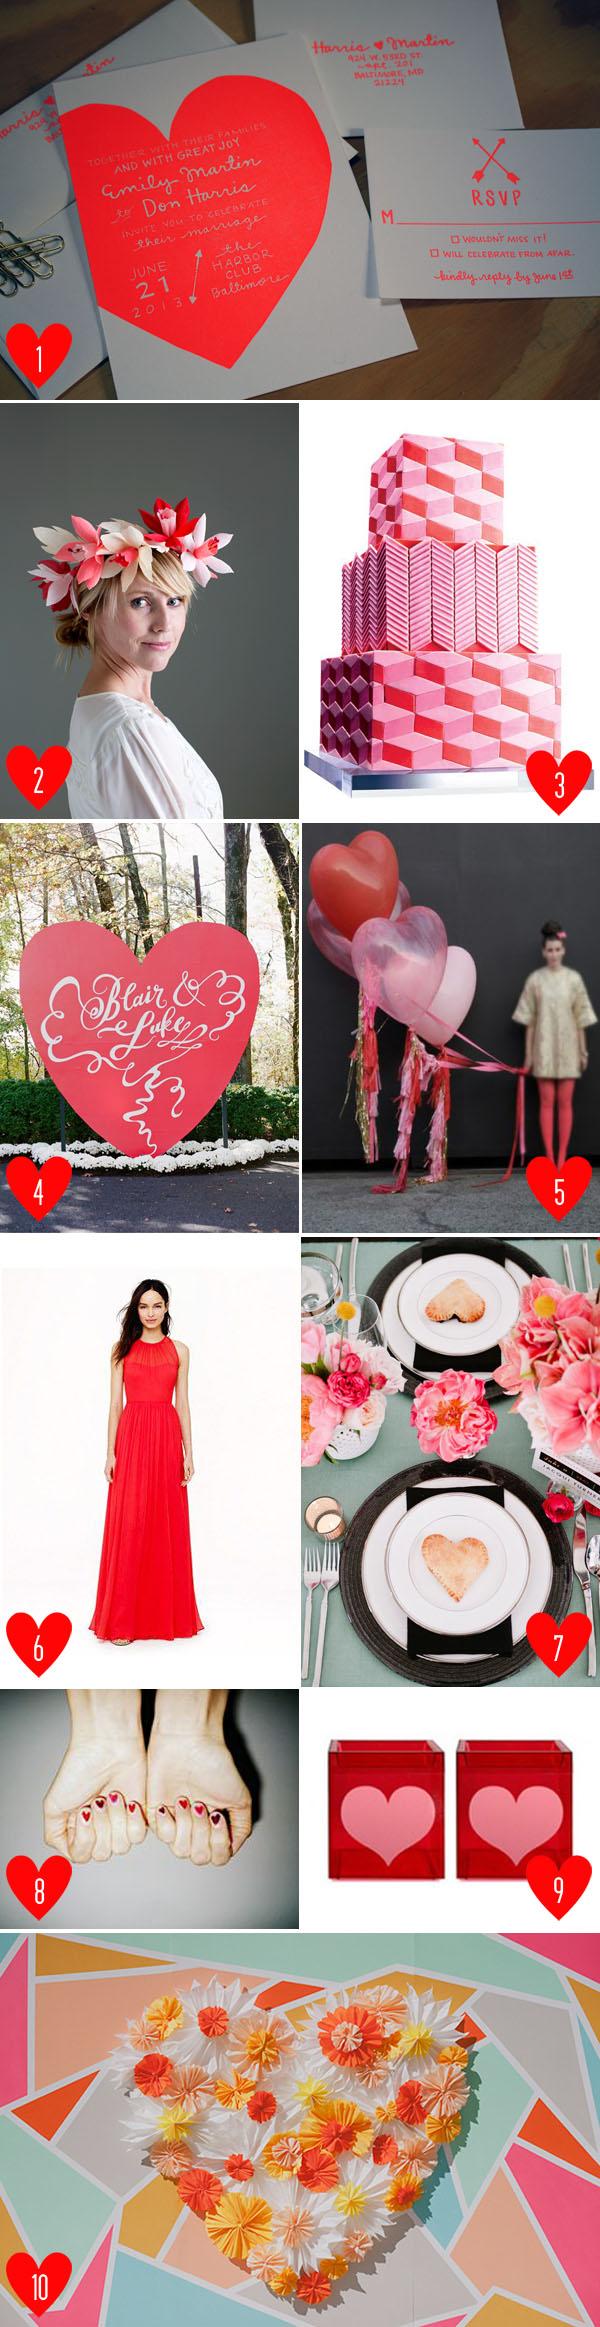 valentines day inspiration 3